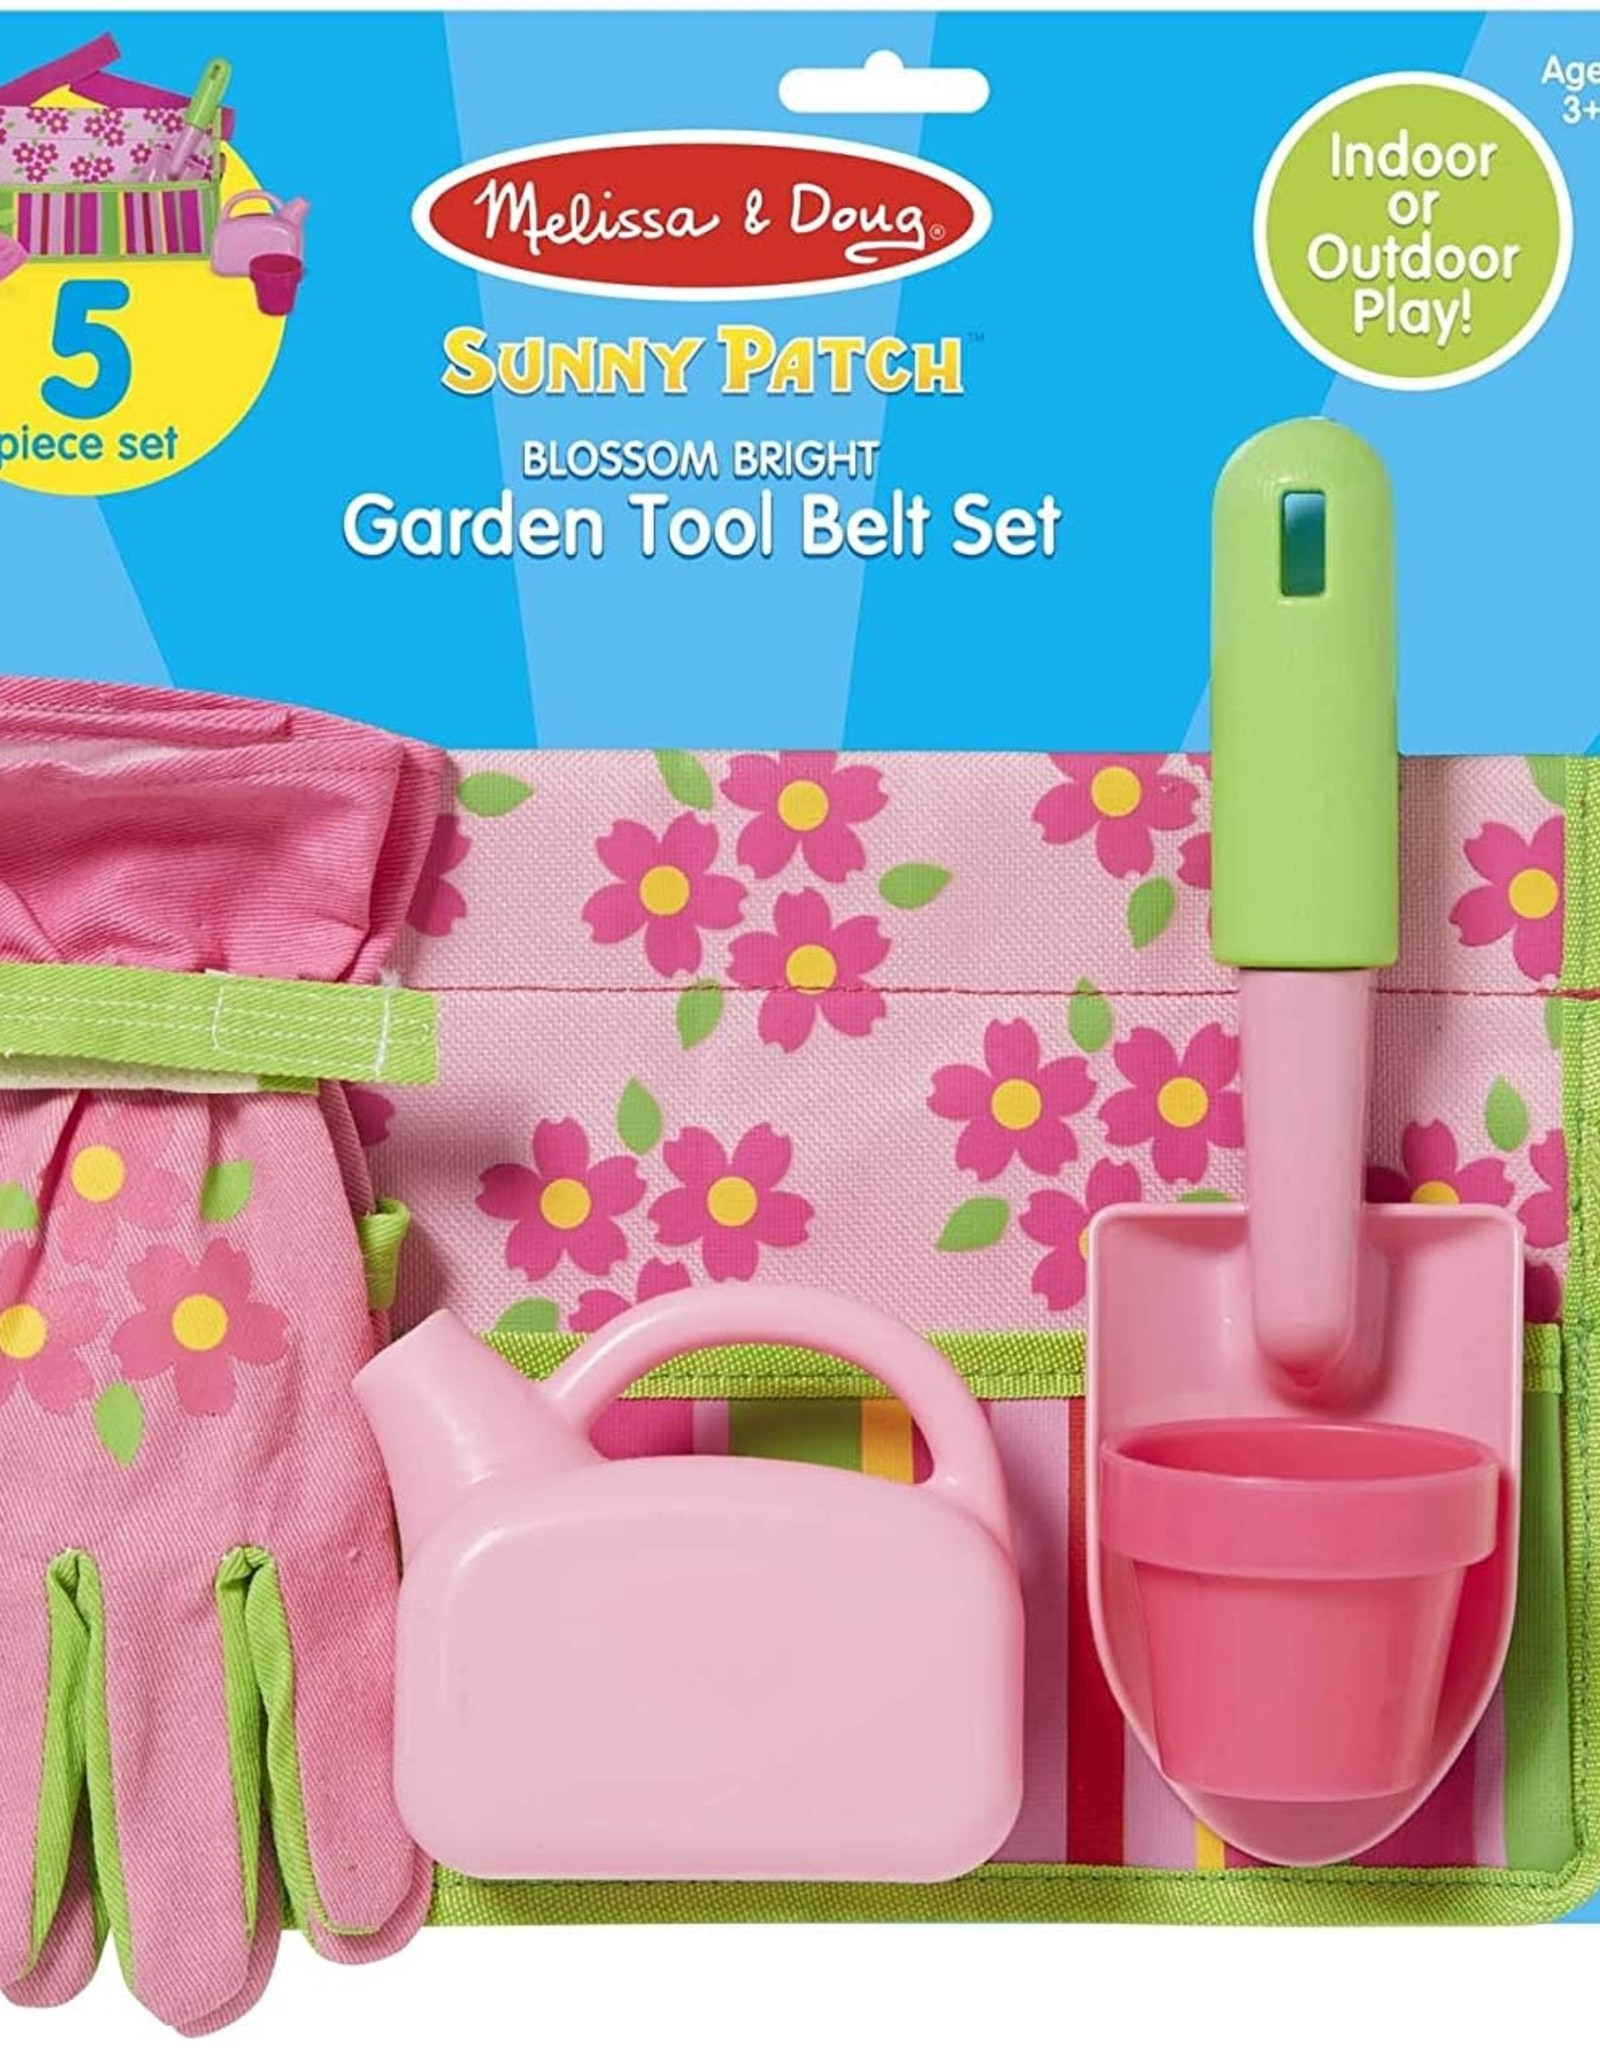 Melissa & Doug Melissa & Doug Sunny Patch Blossom Bright Garden Tool Belt Set